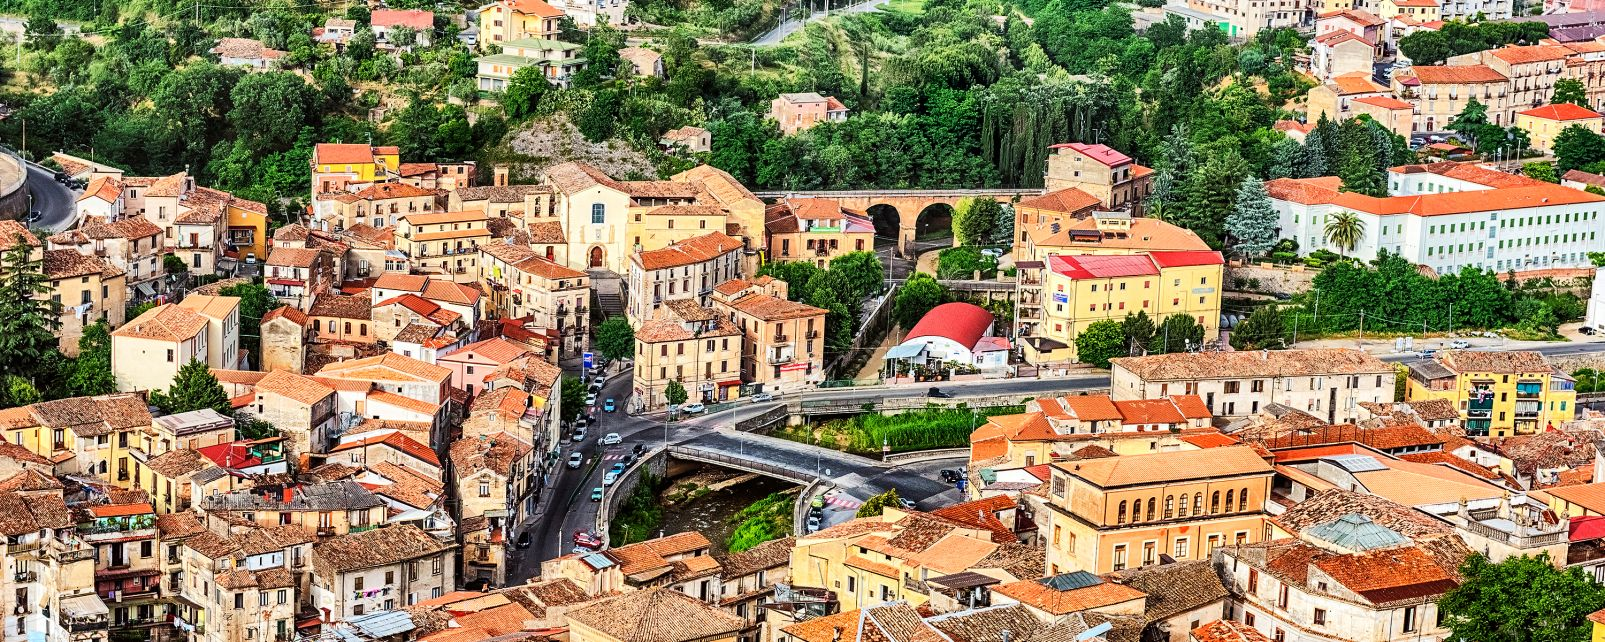 Cosenza, Kalabrien, Italien